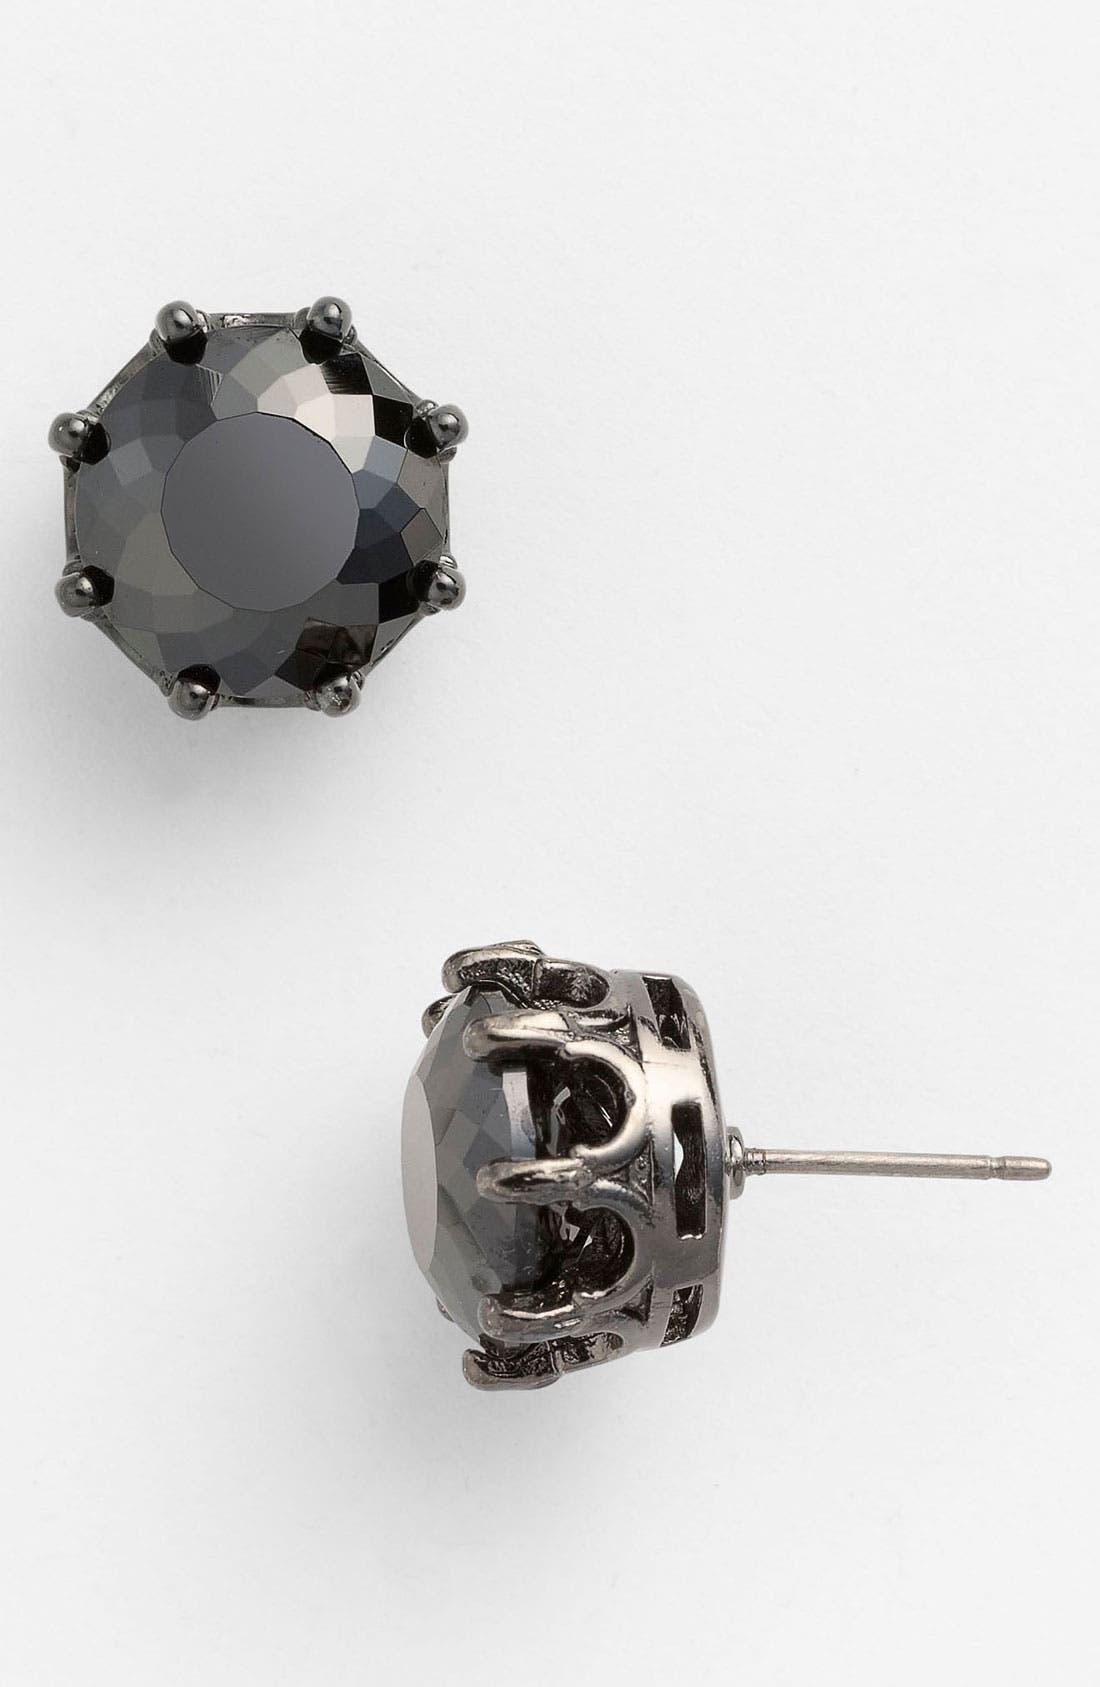 Alternate Image 1 Selected - Juicy Couture 'Punk Rocks' Oversized Stud Earrings